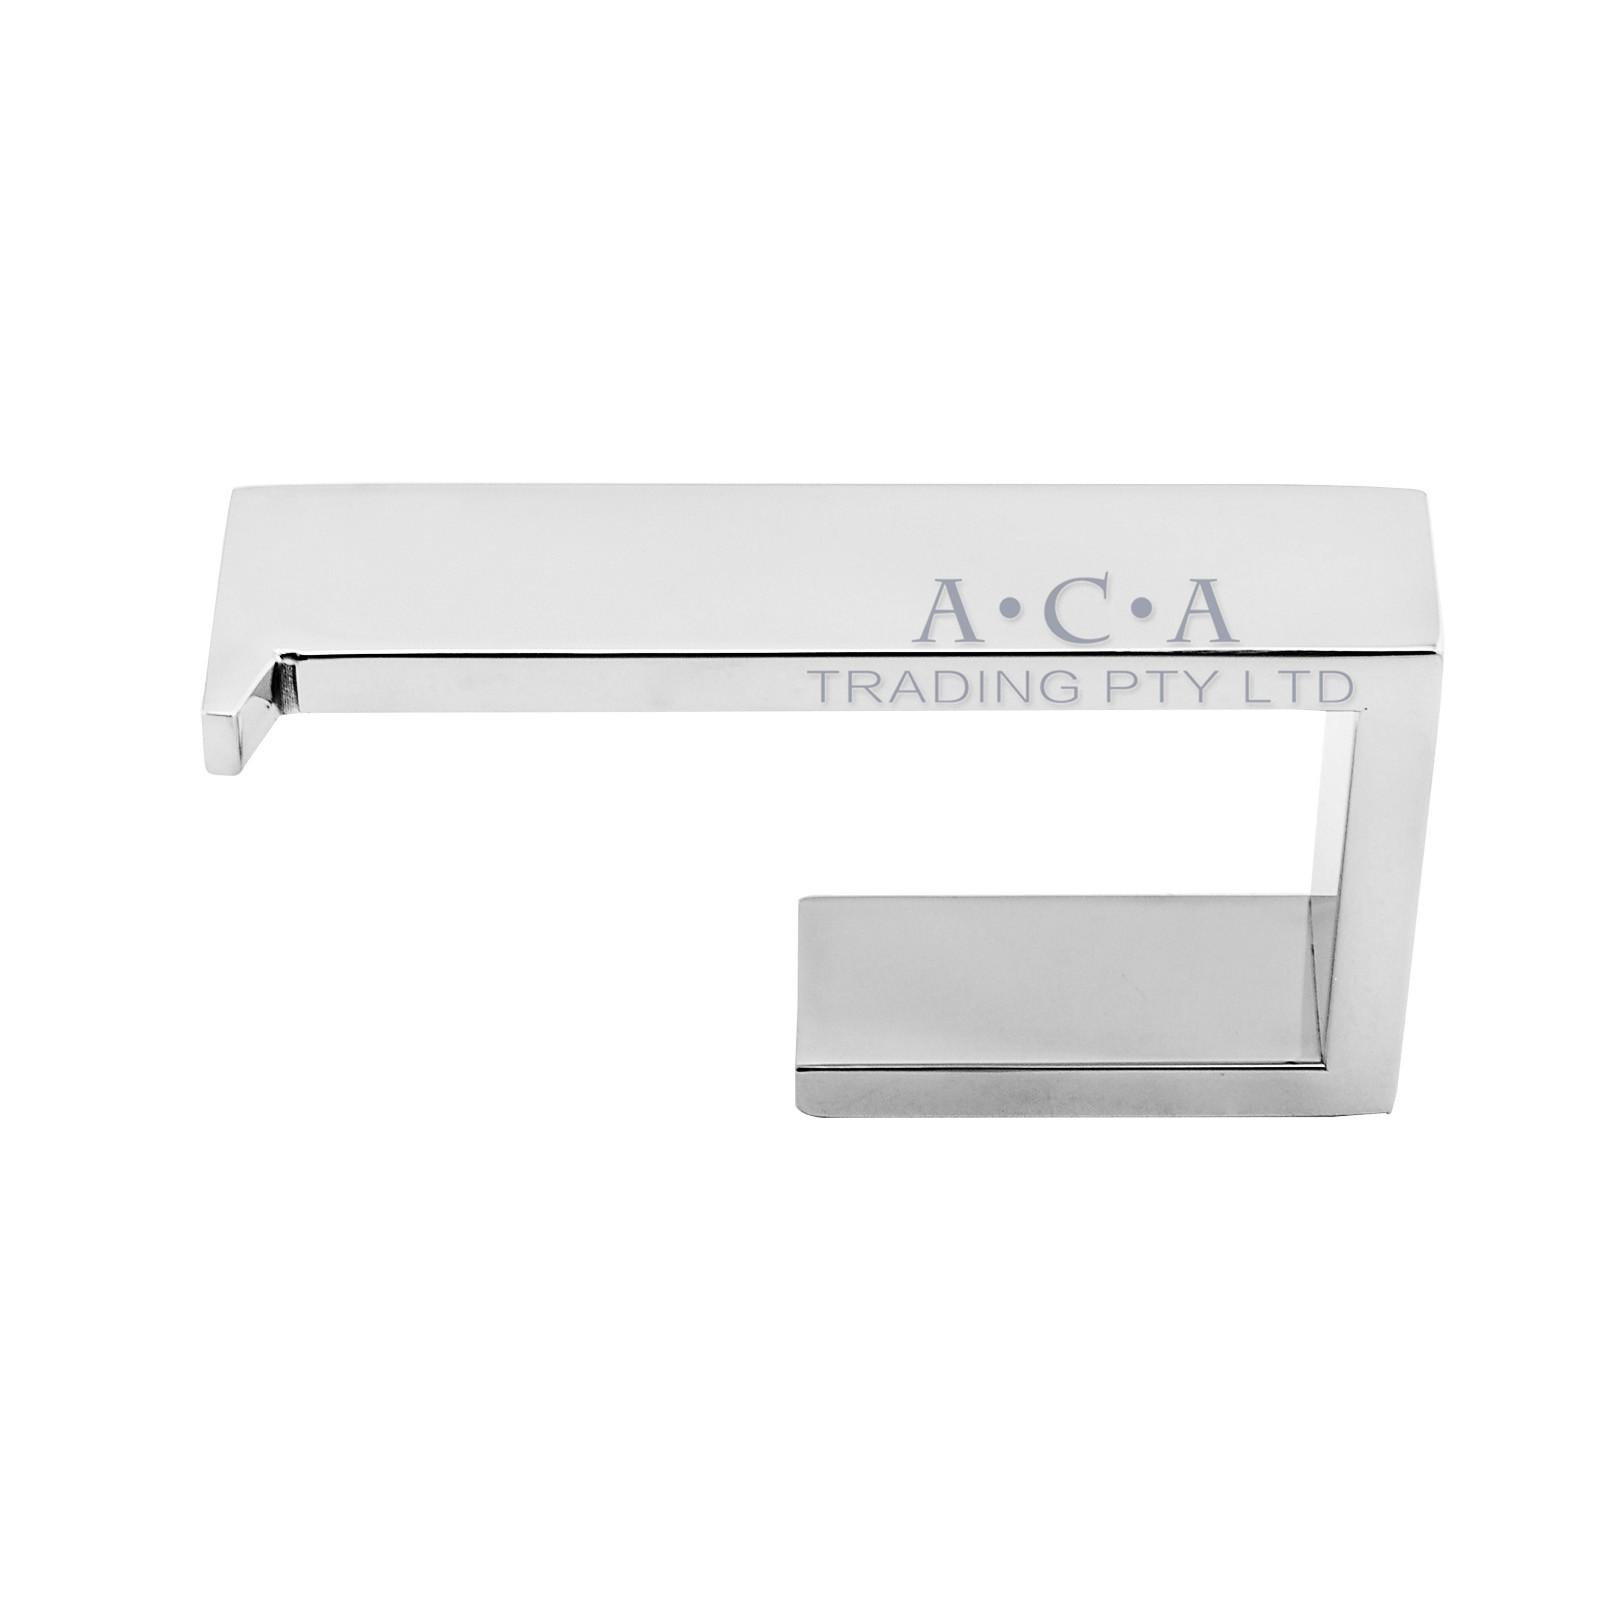 aca toilet paper roll holder chrome 304 stainless steel wall mount hook bathroom ebay. Black Bedroom Furniture Sets. Home Design Ideas